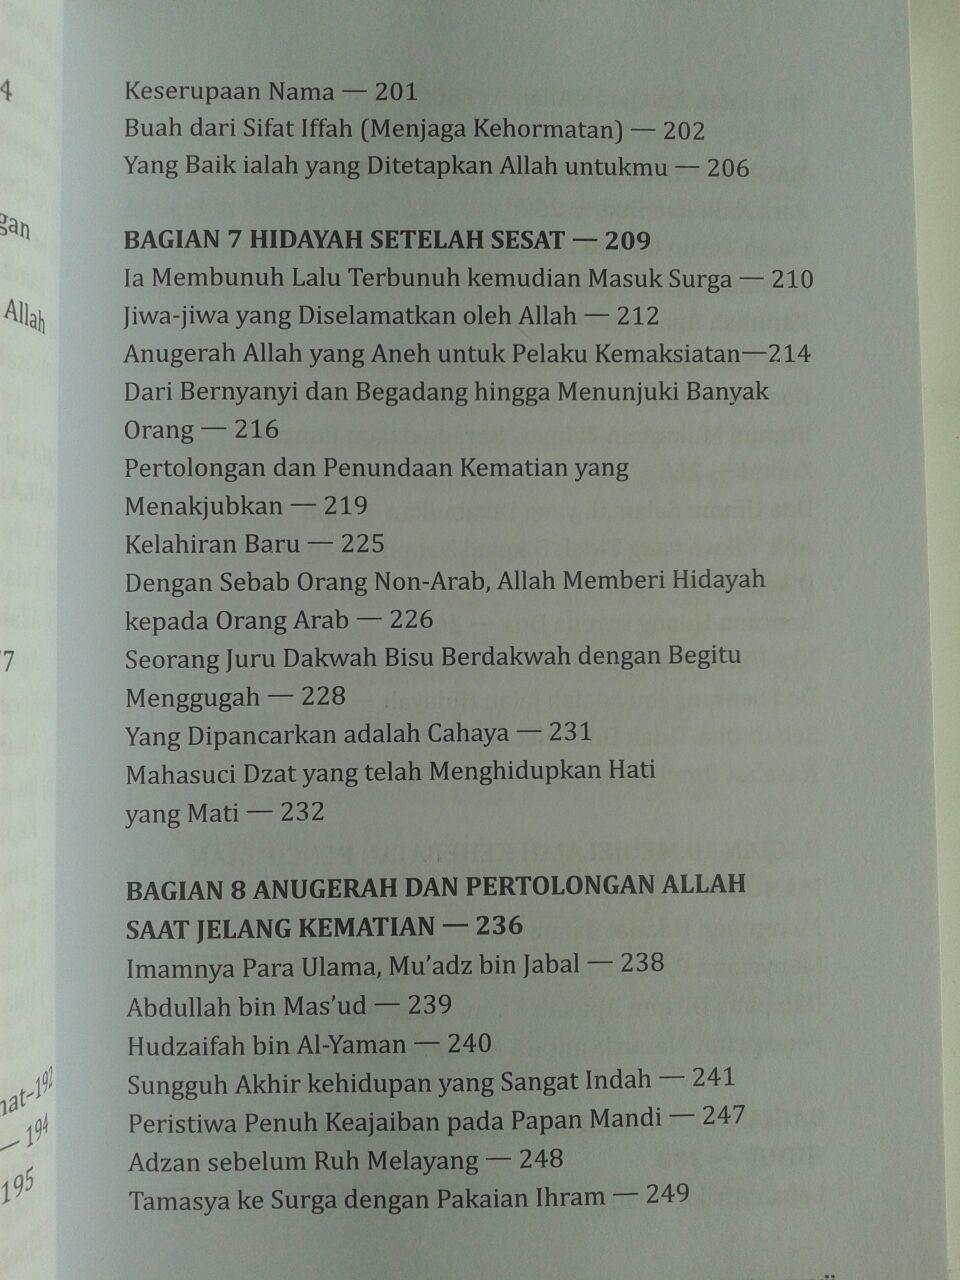 Buku Kisah-Kisah Indah Kelembutan Allah Pustaka Al-Kautsar Sayyid Uthwah isi 3